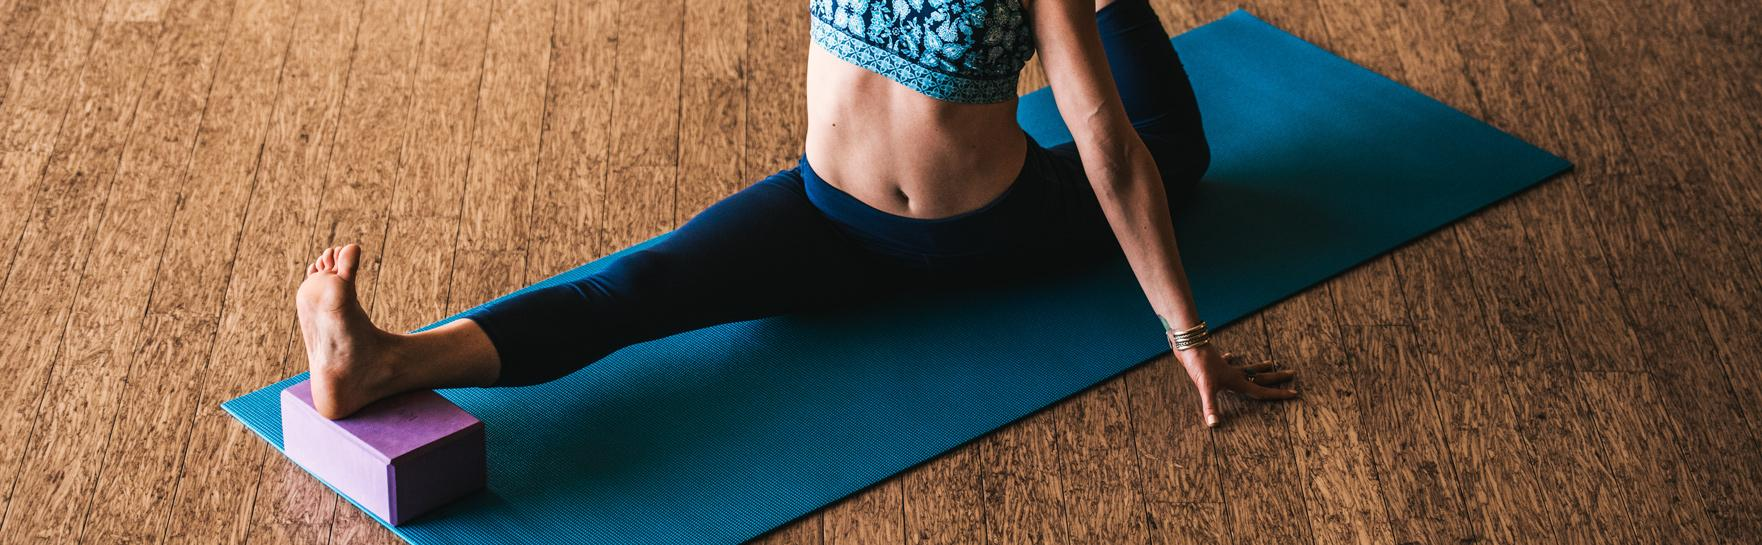 Amazon.com : Gaiam Yoga Block (Set of 2) - Supportive